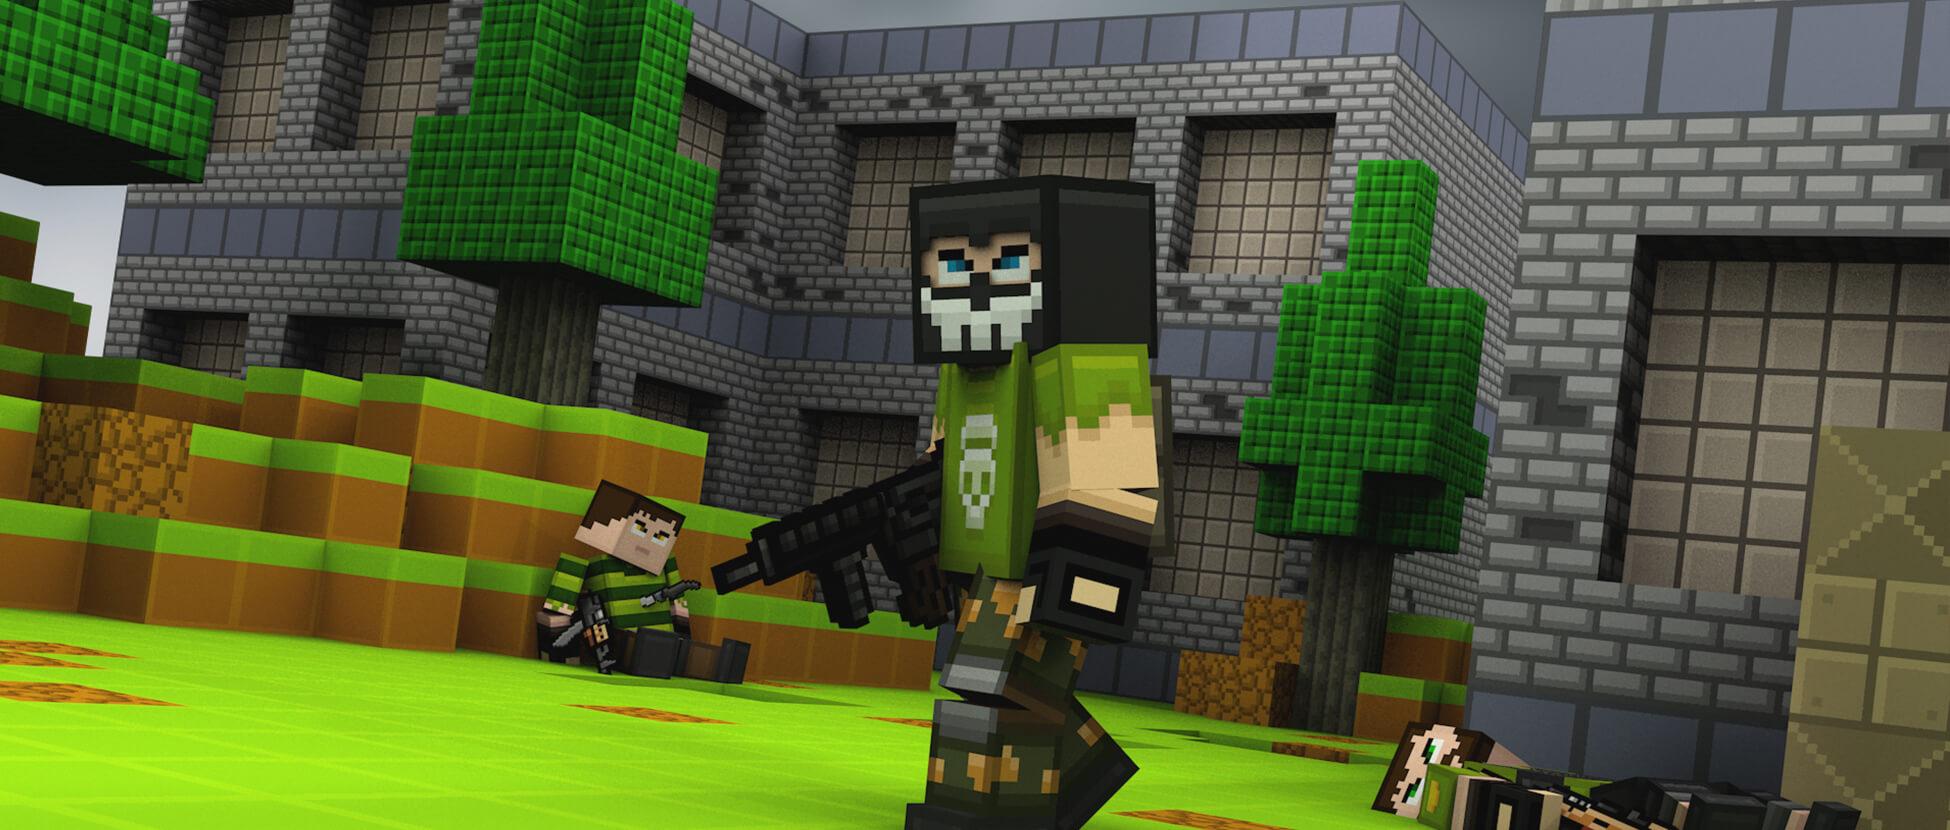 Blockpost IDC/Games